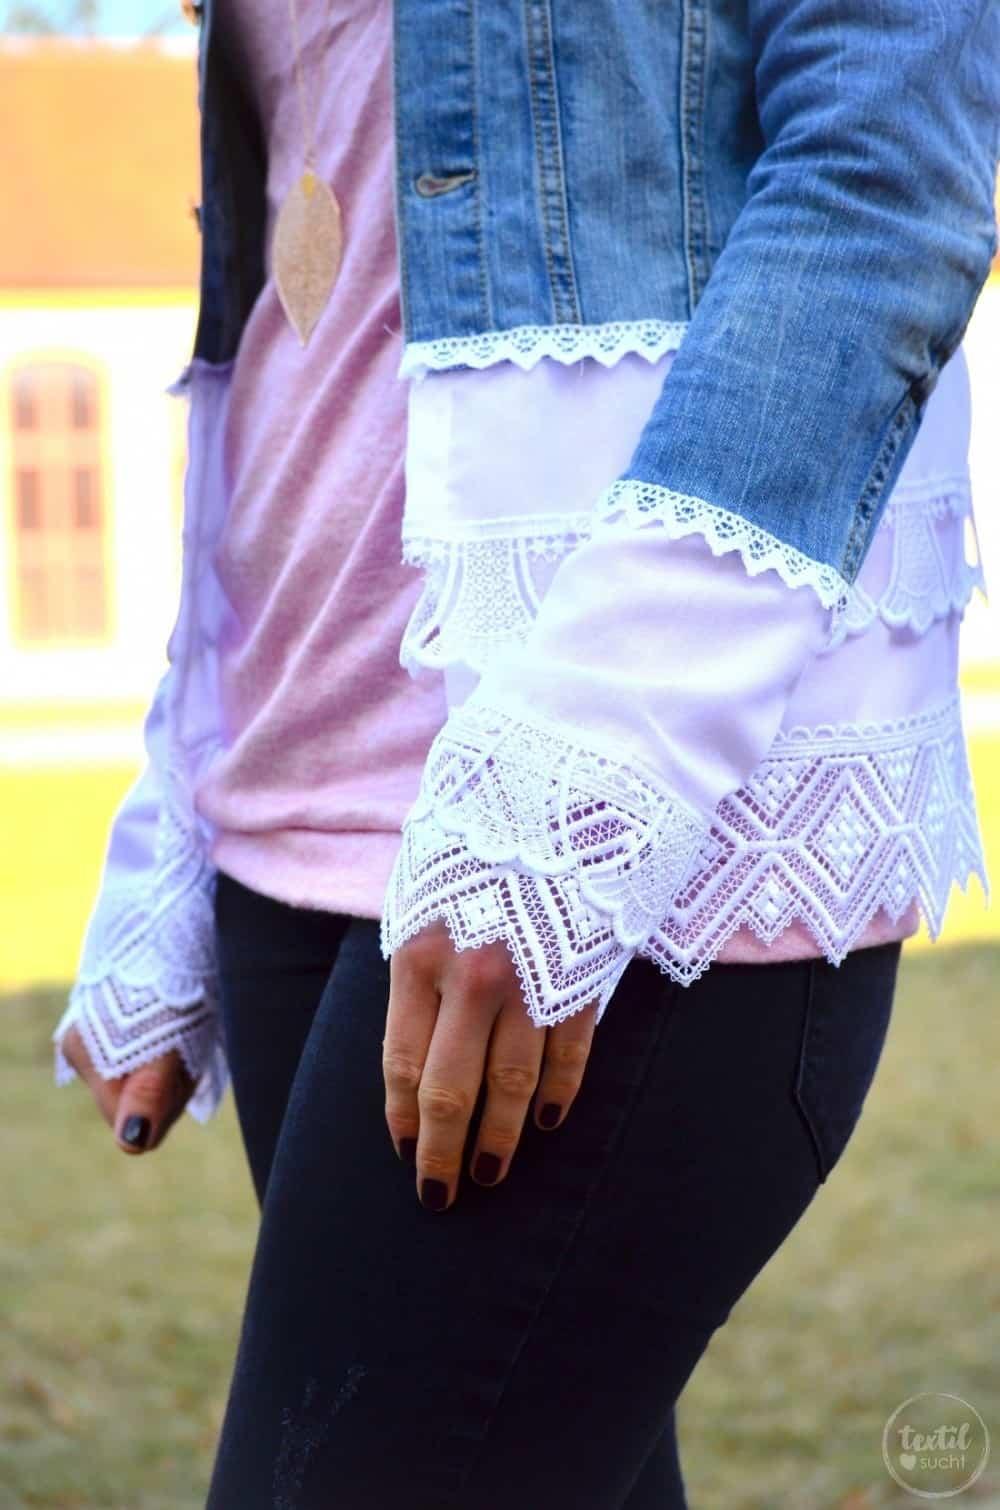 Tutorial: Jeansjacke Upcycling - Die fertige Jacke - Bild 3 | textilsucht.de